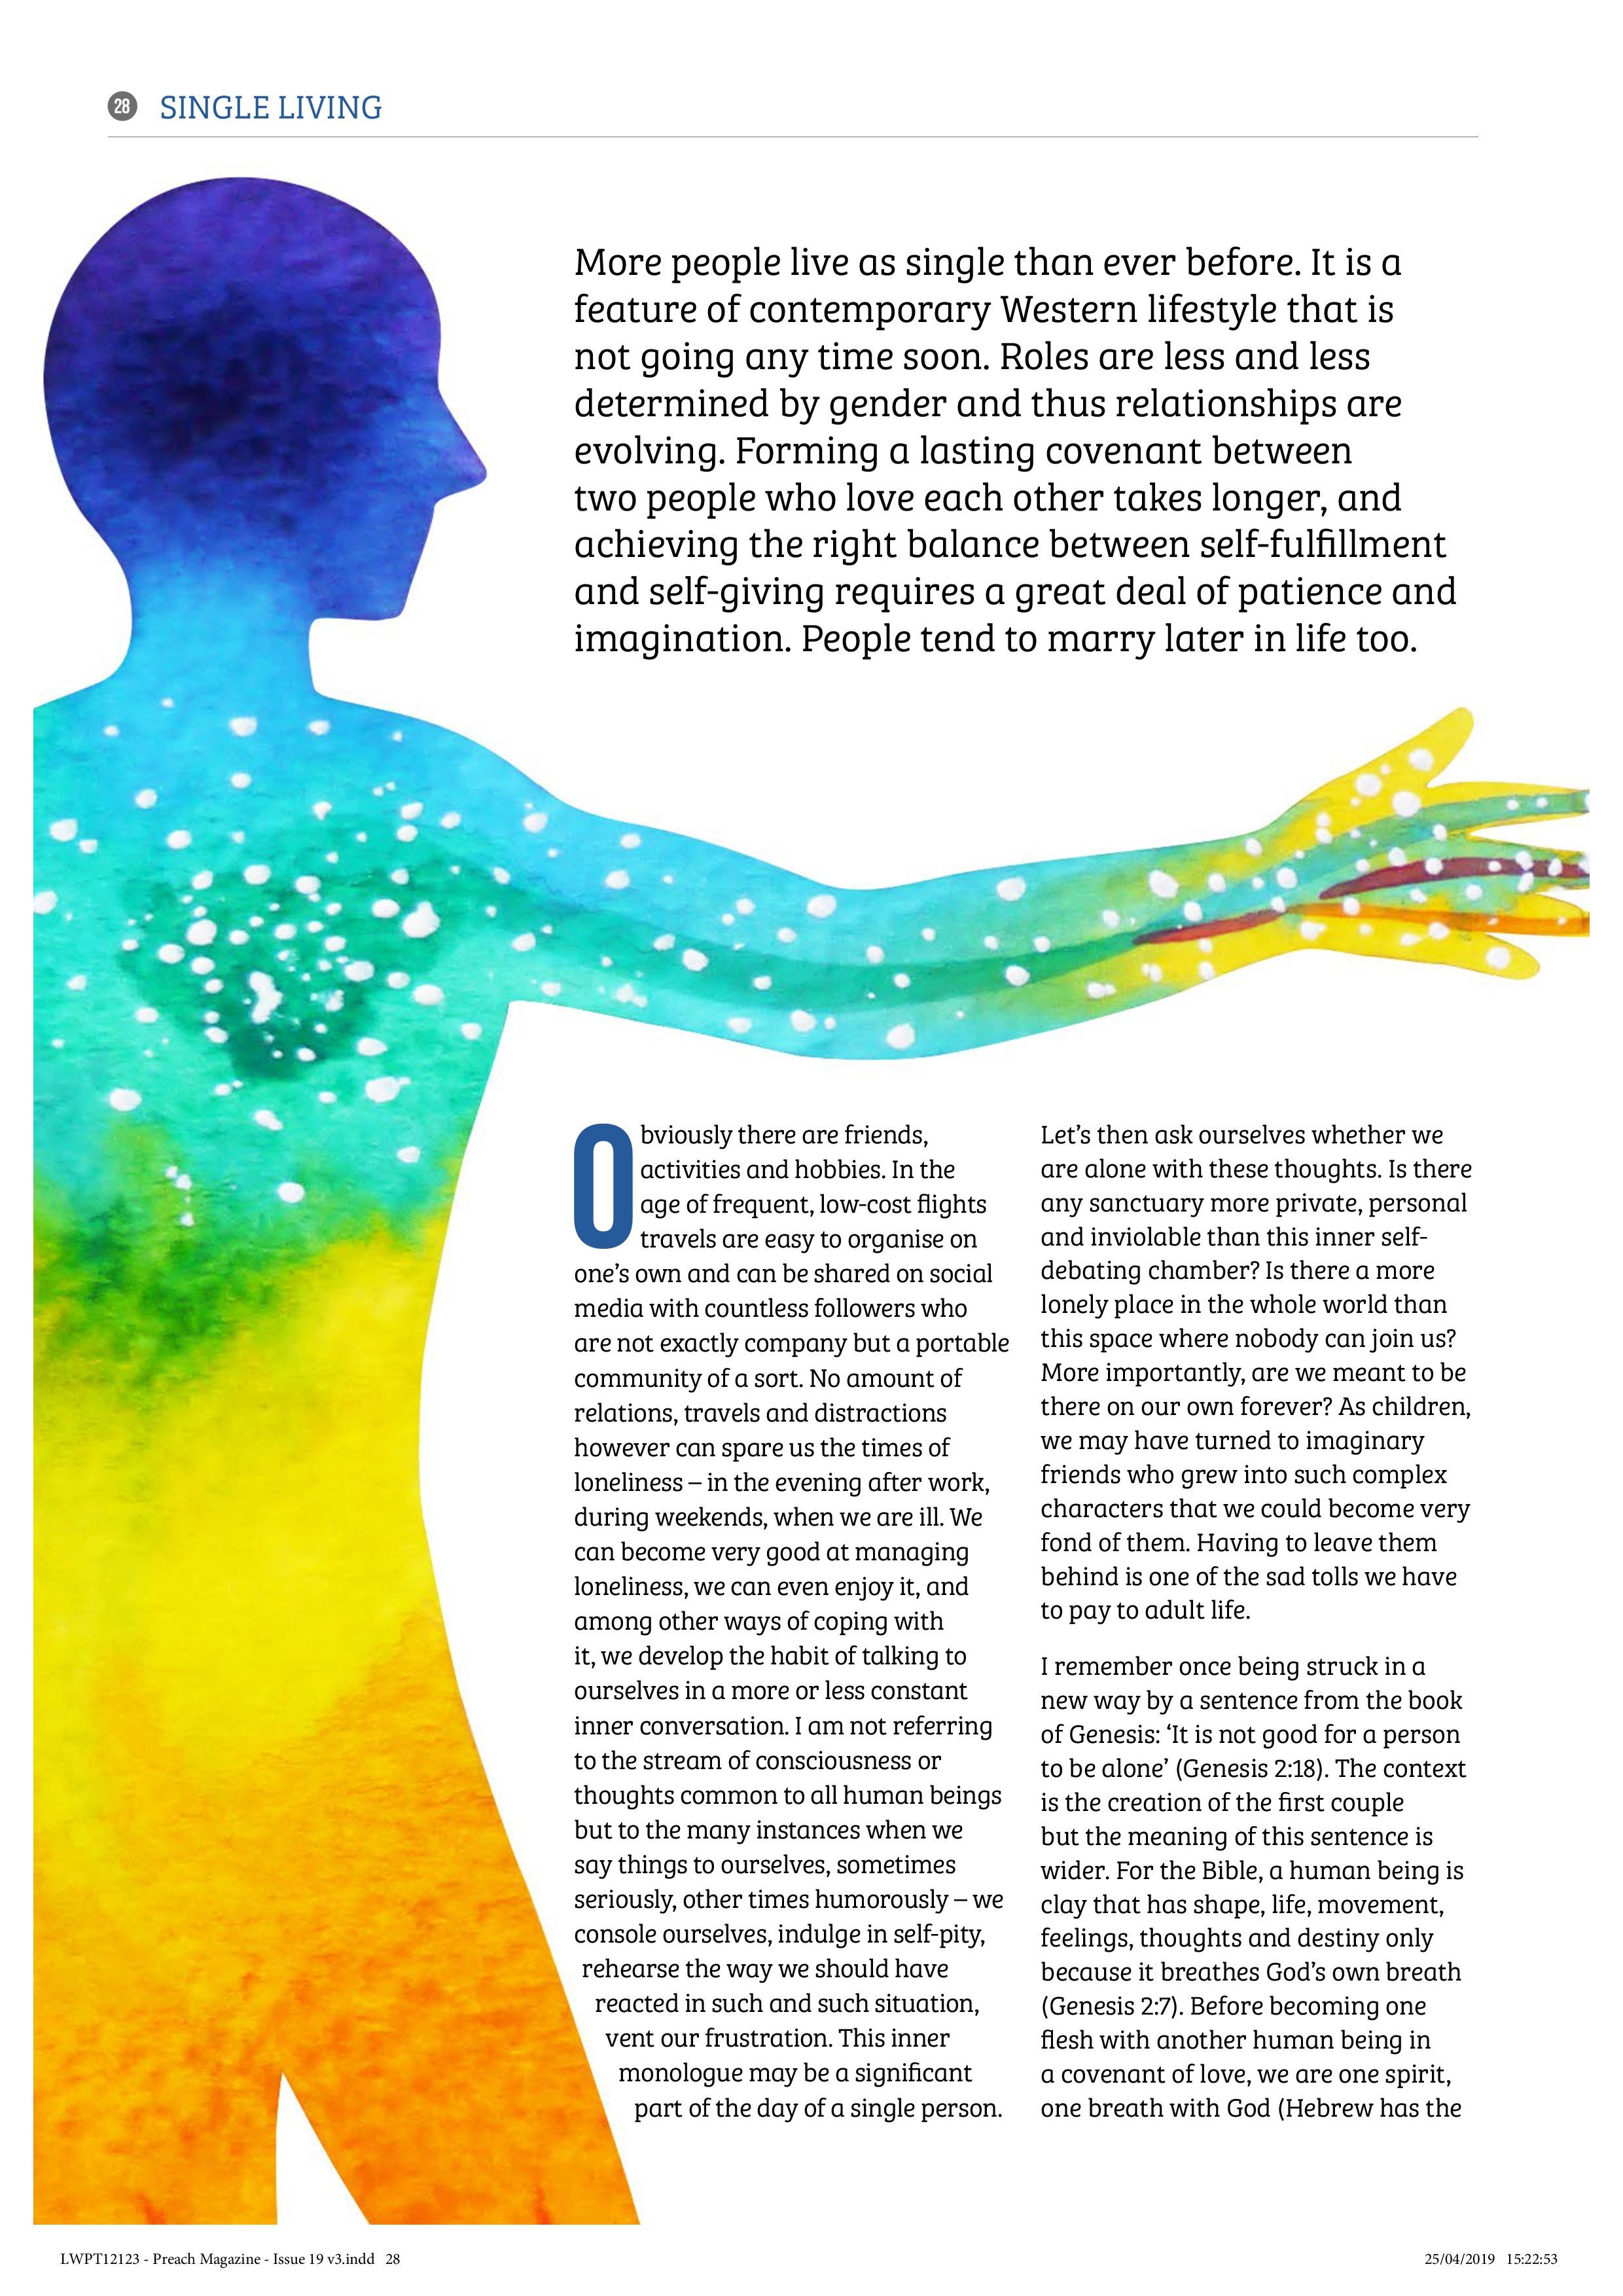 Preach Magazine - Issue 19 - Luigi Gioia-page-2.jpg